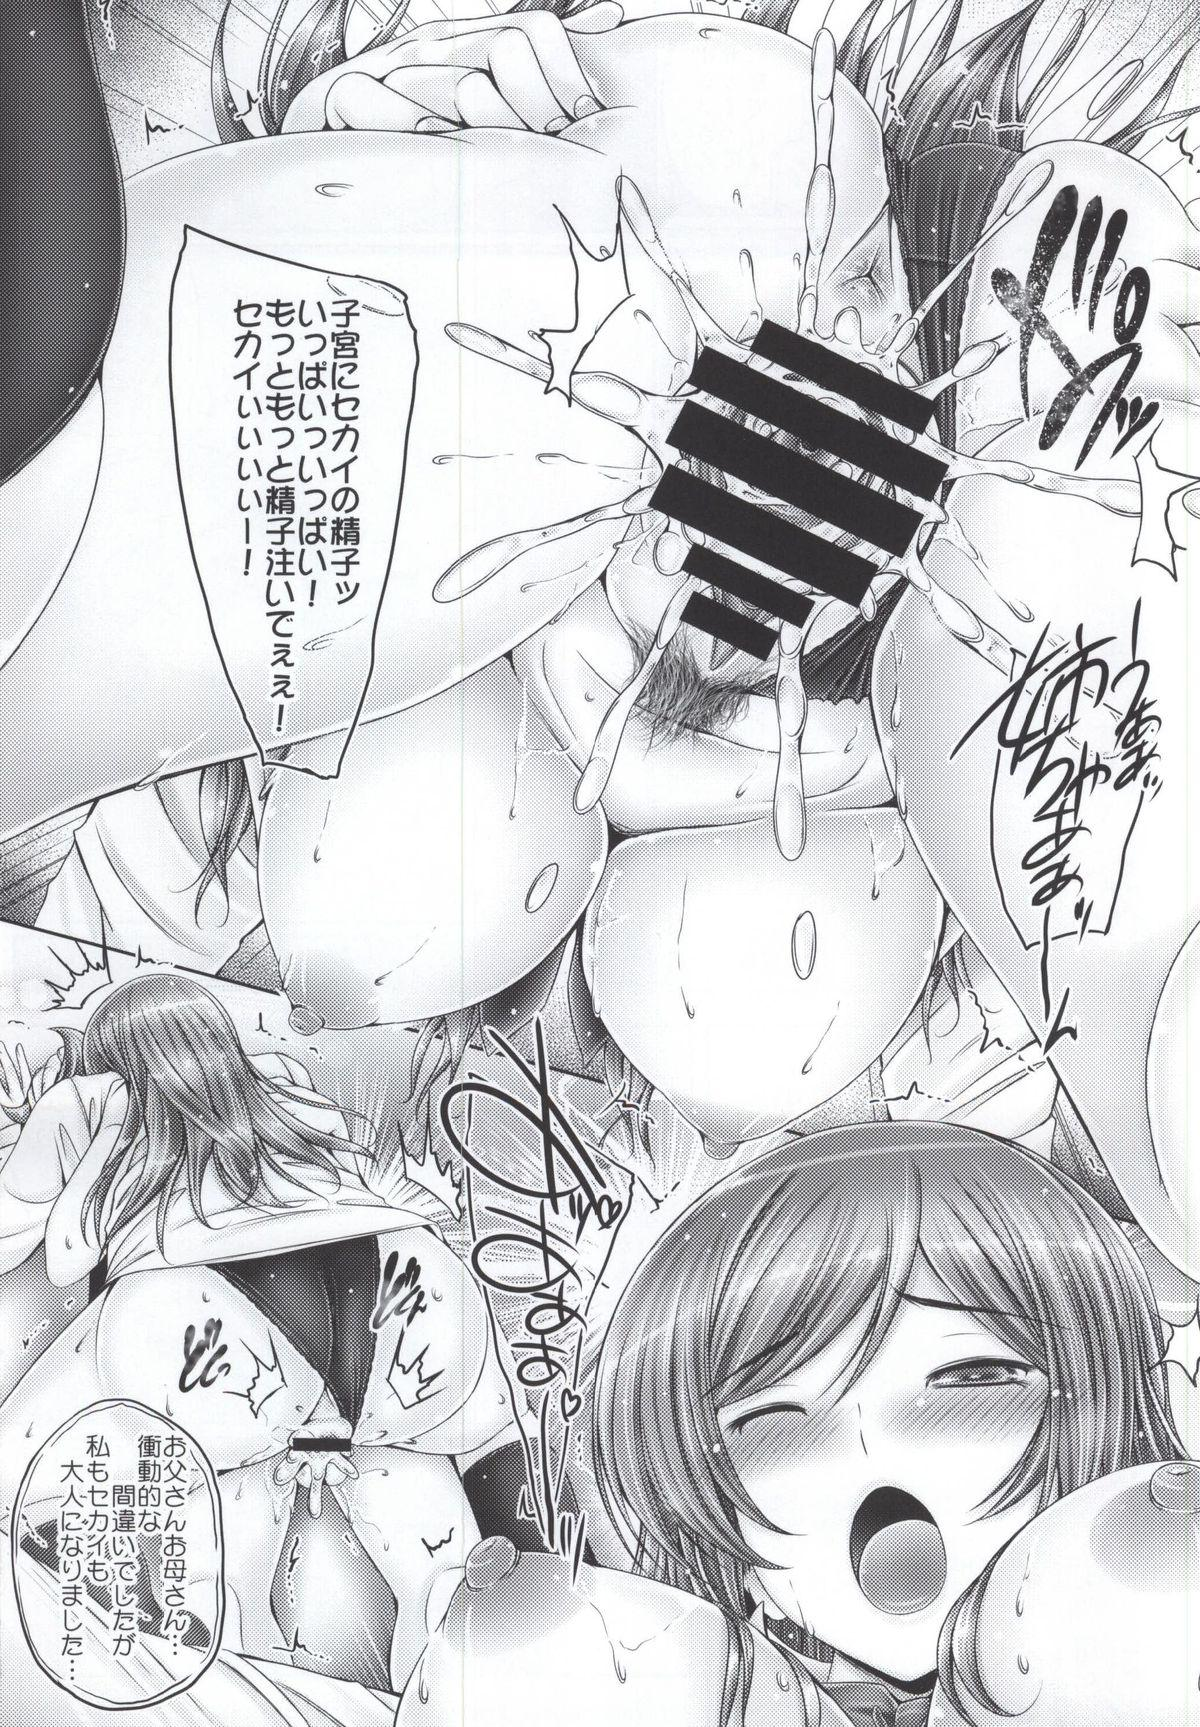 Mirai no Shoudouteki na Machigai 19